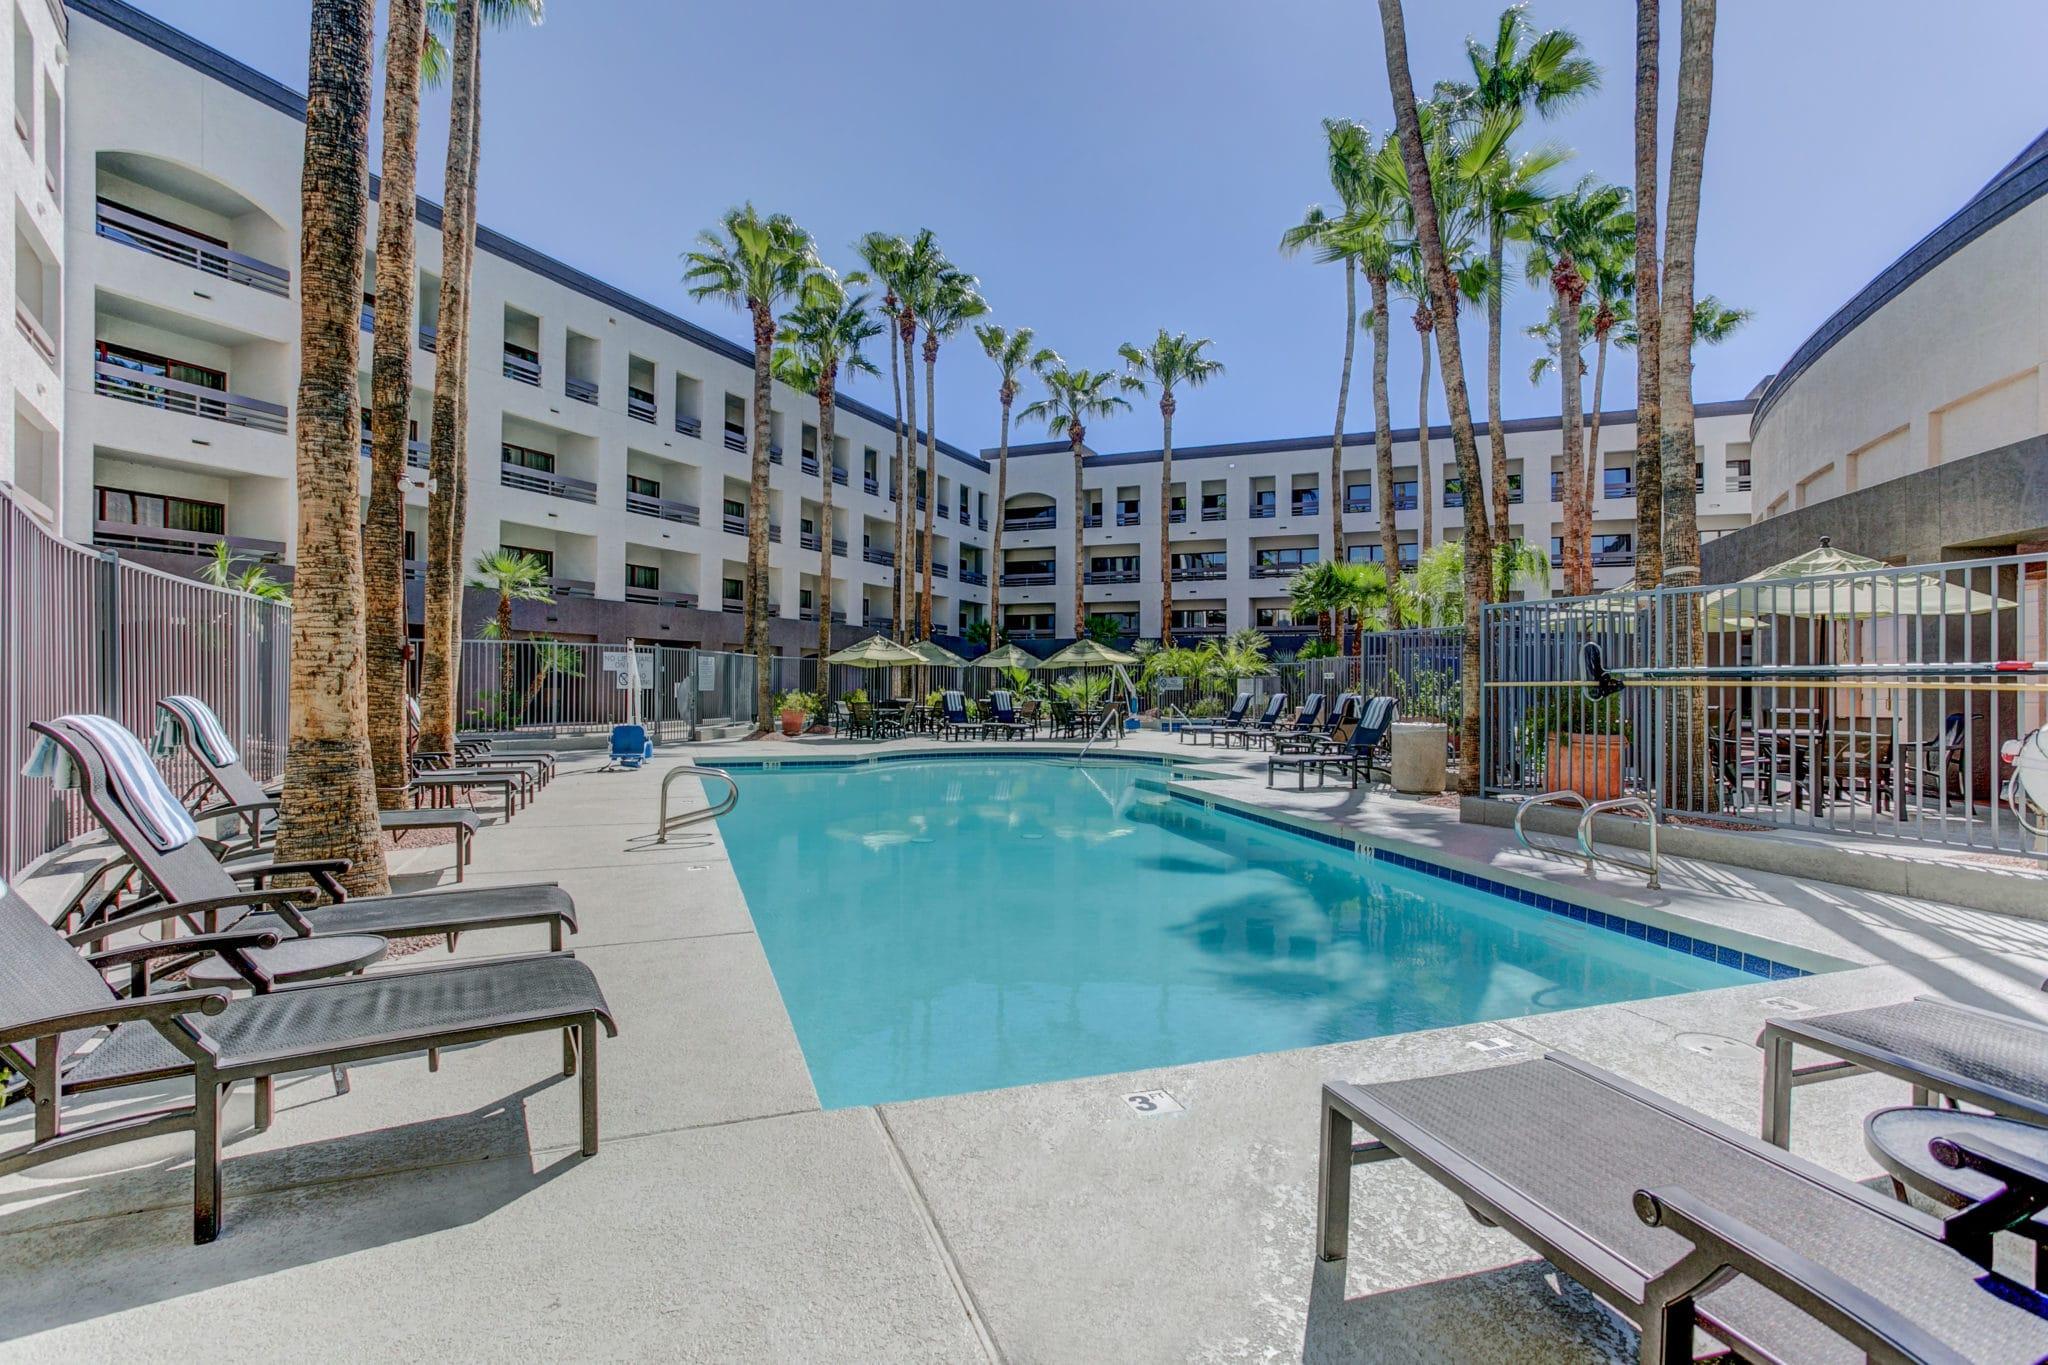 Pool area at the Hilton Phoenix hotel